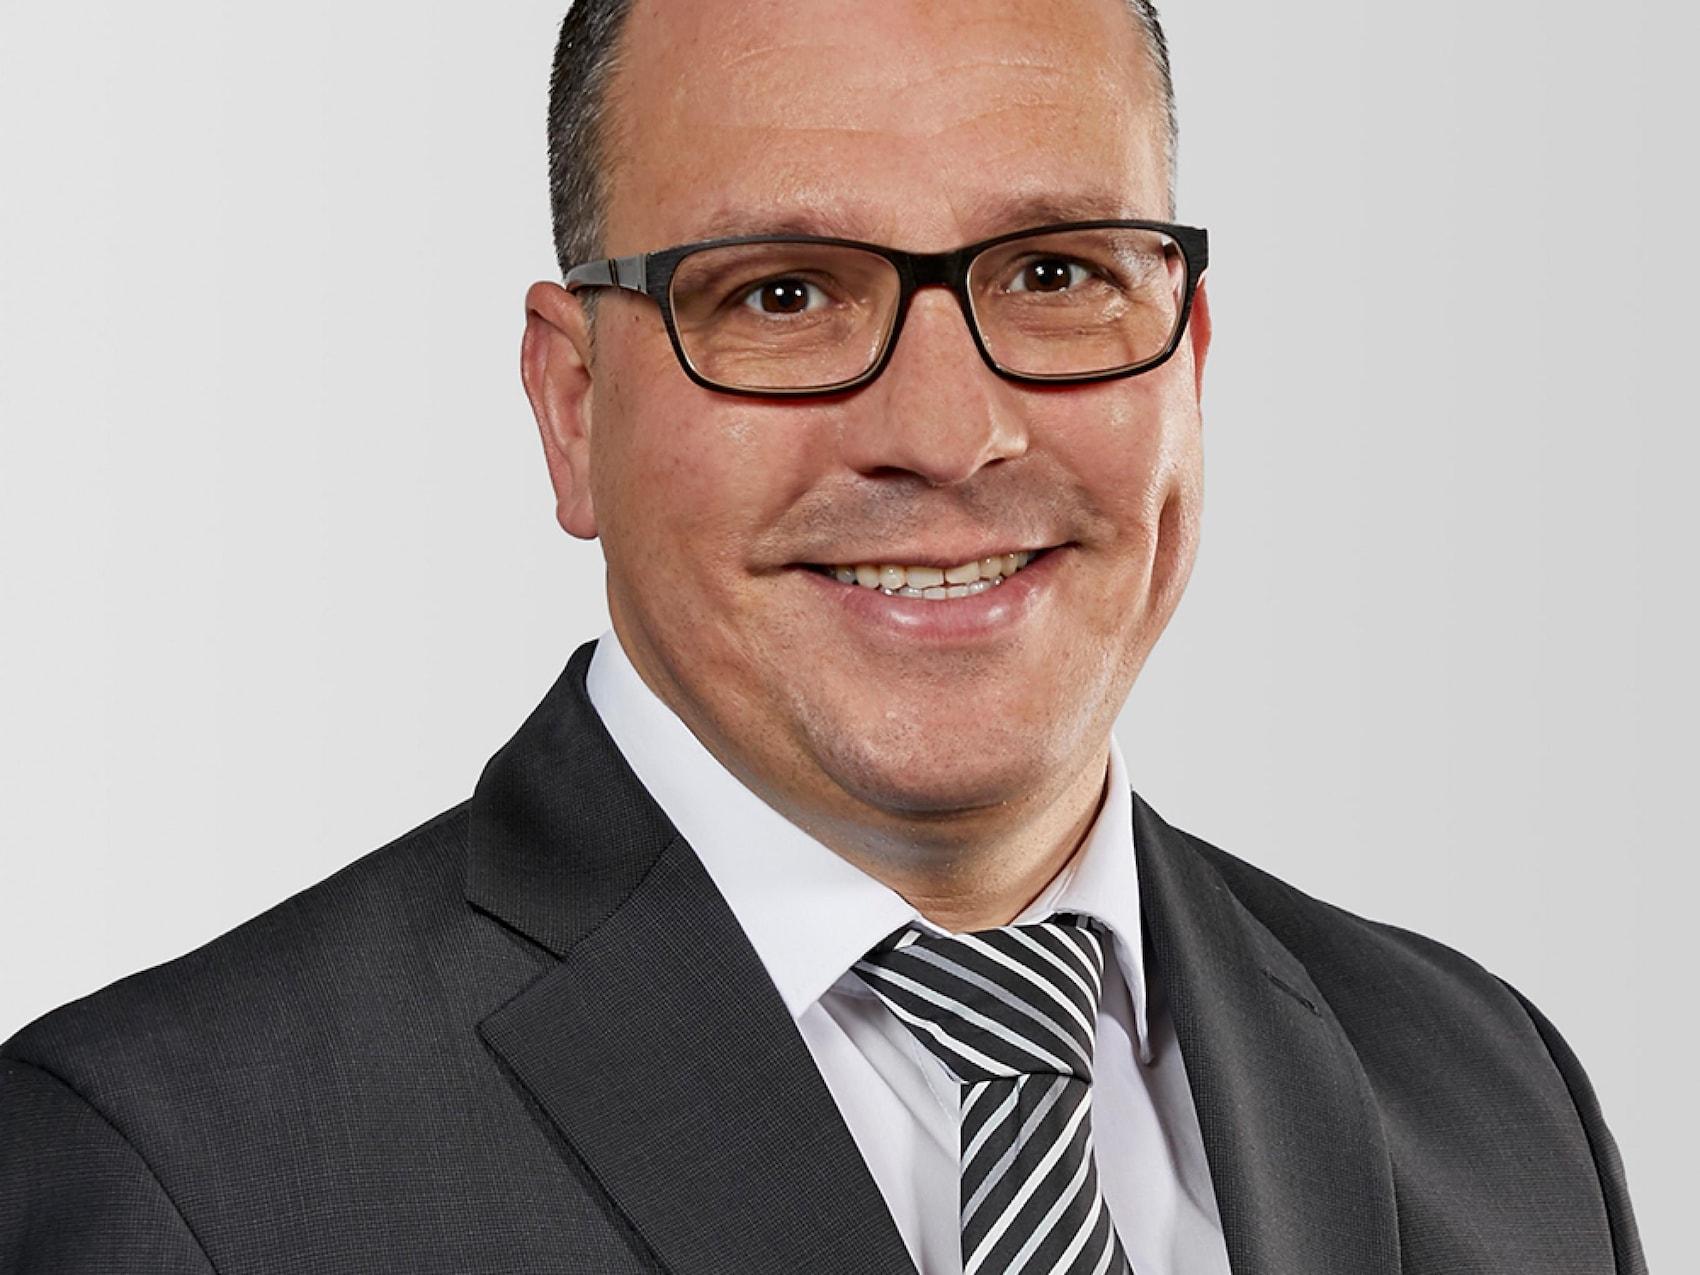 Kohl-Steffen